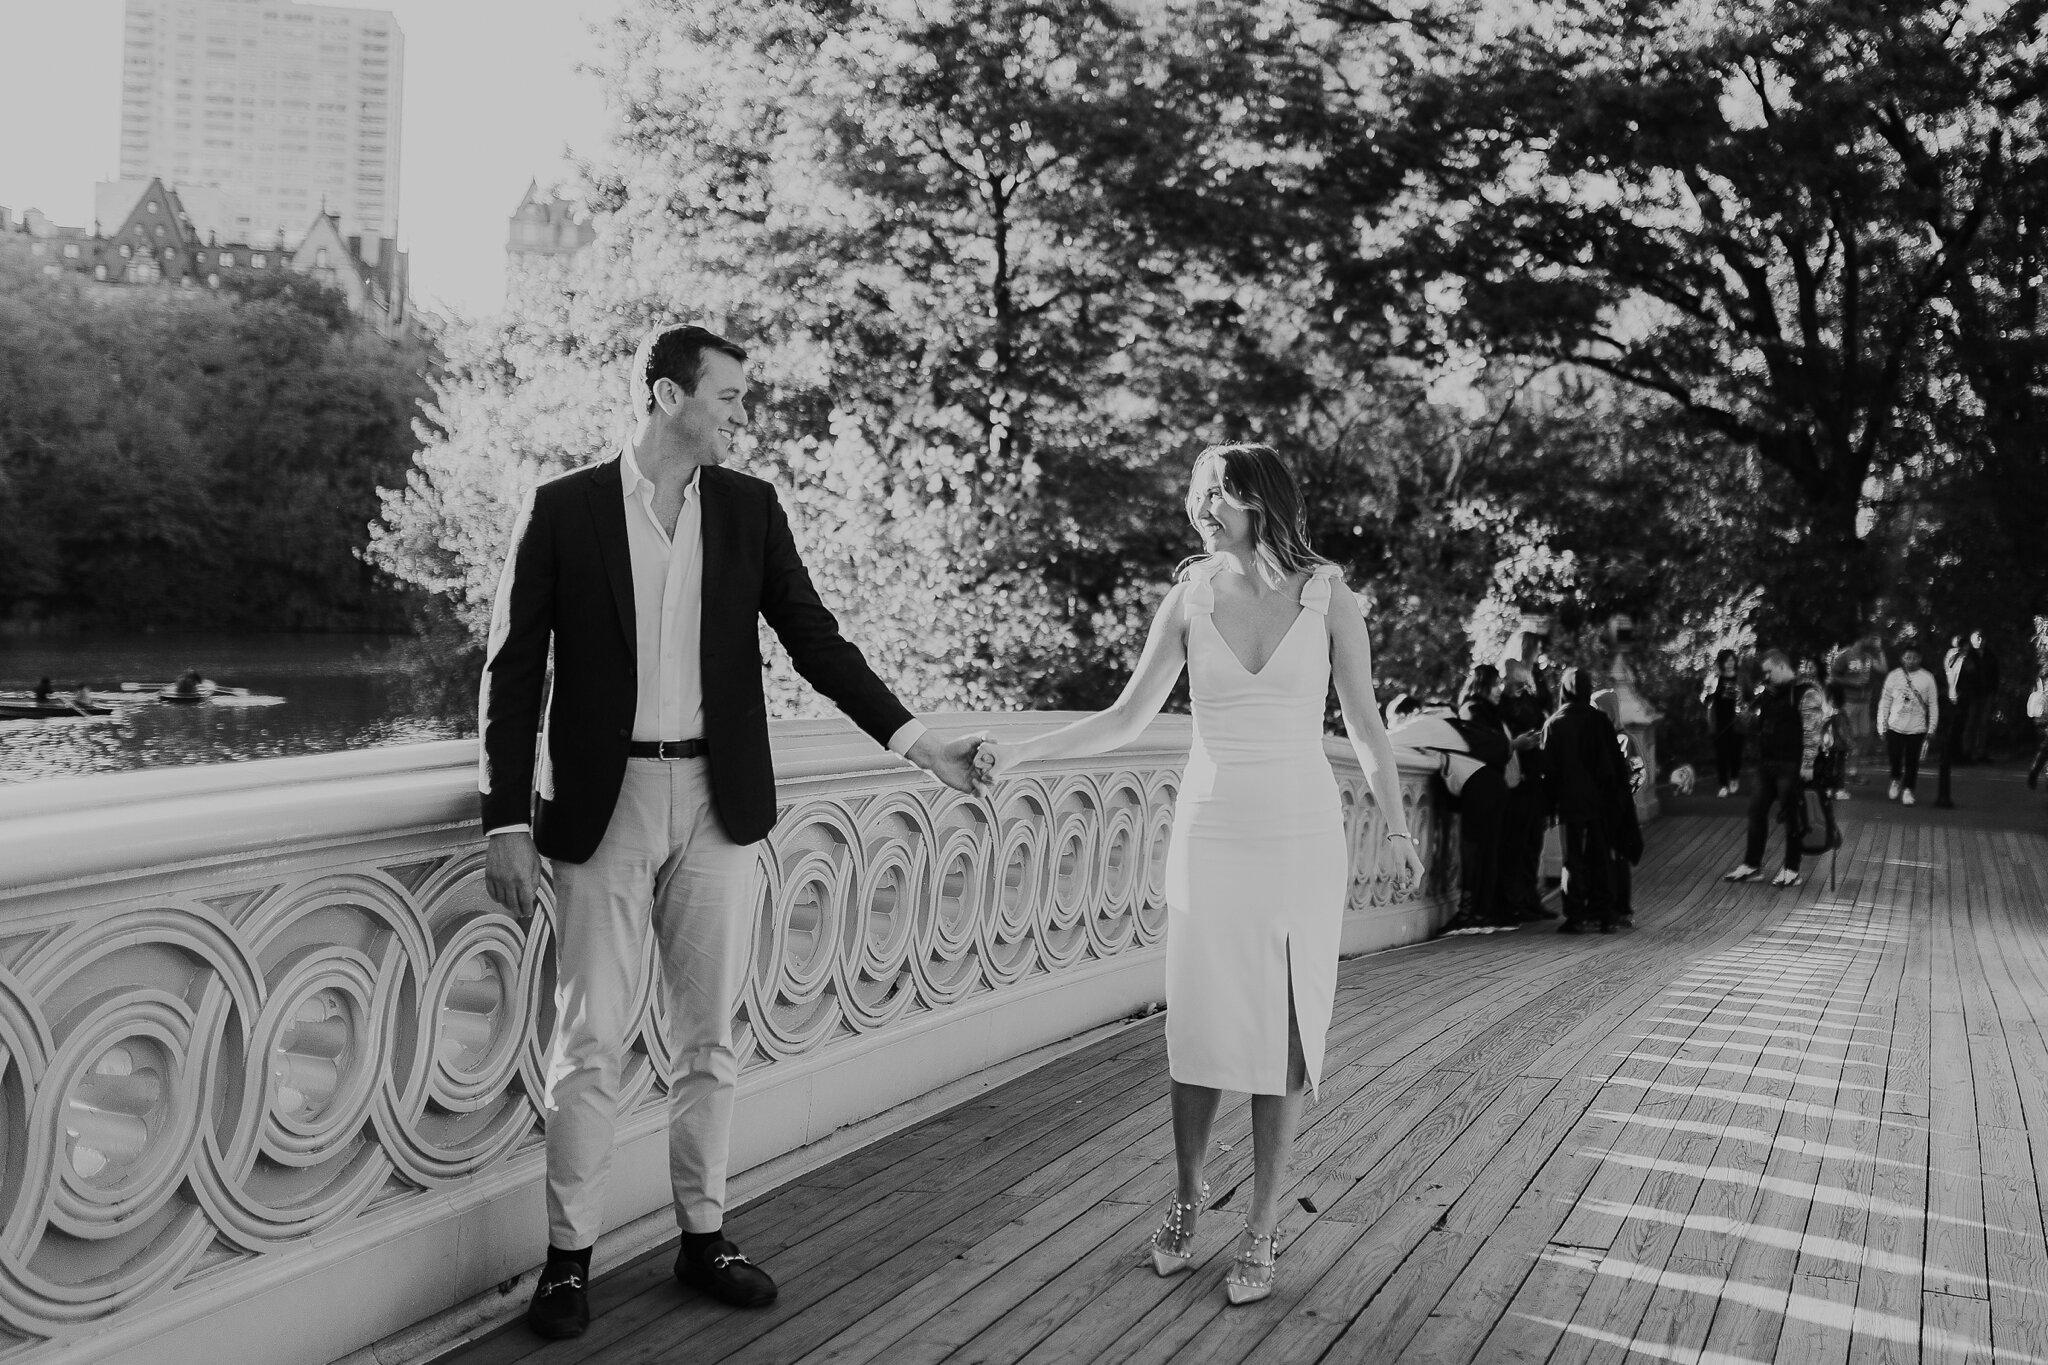 Alicia+lucia+photography+-+albuquerque+wedding+photographer+-+santa+fe+wedding+photography+-+new+mexico+wedding+photographer+-+new+mexico+wedding+-+engagement+-+new+york+engagement+-+new+york+city+engagement+-+central+park+engagement_0007.jpg